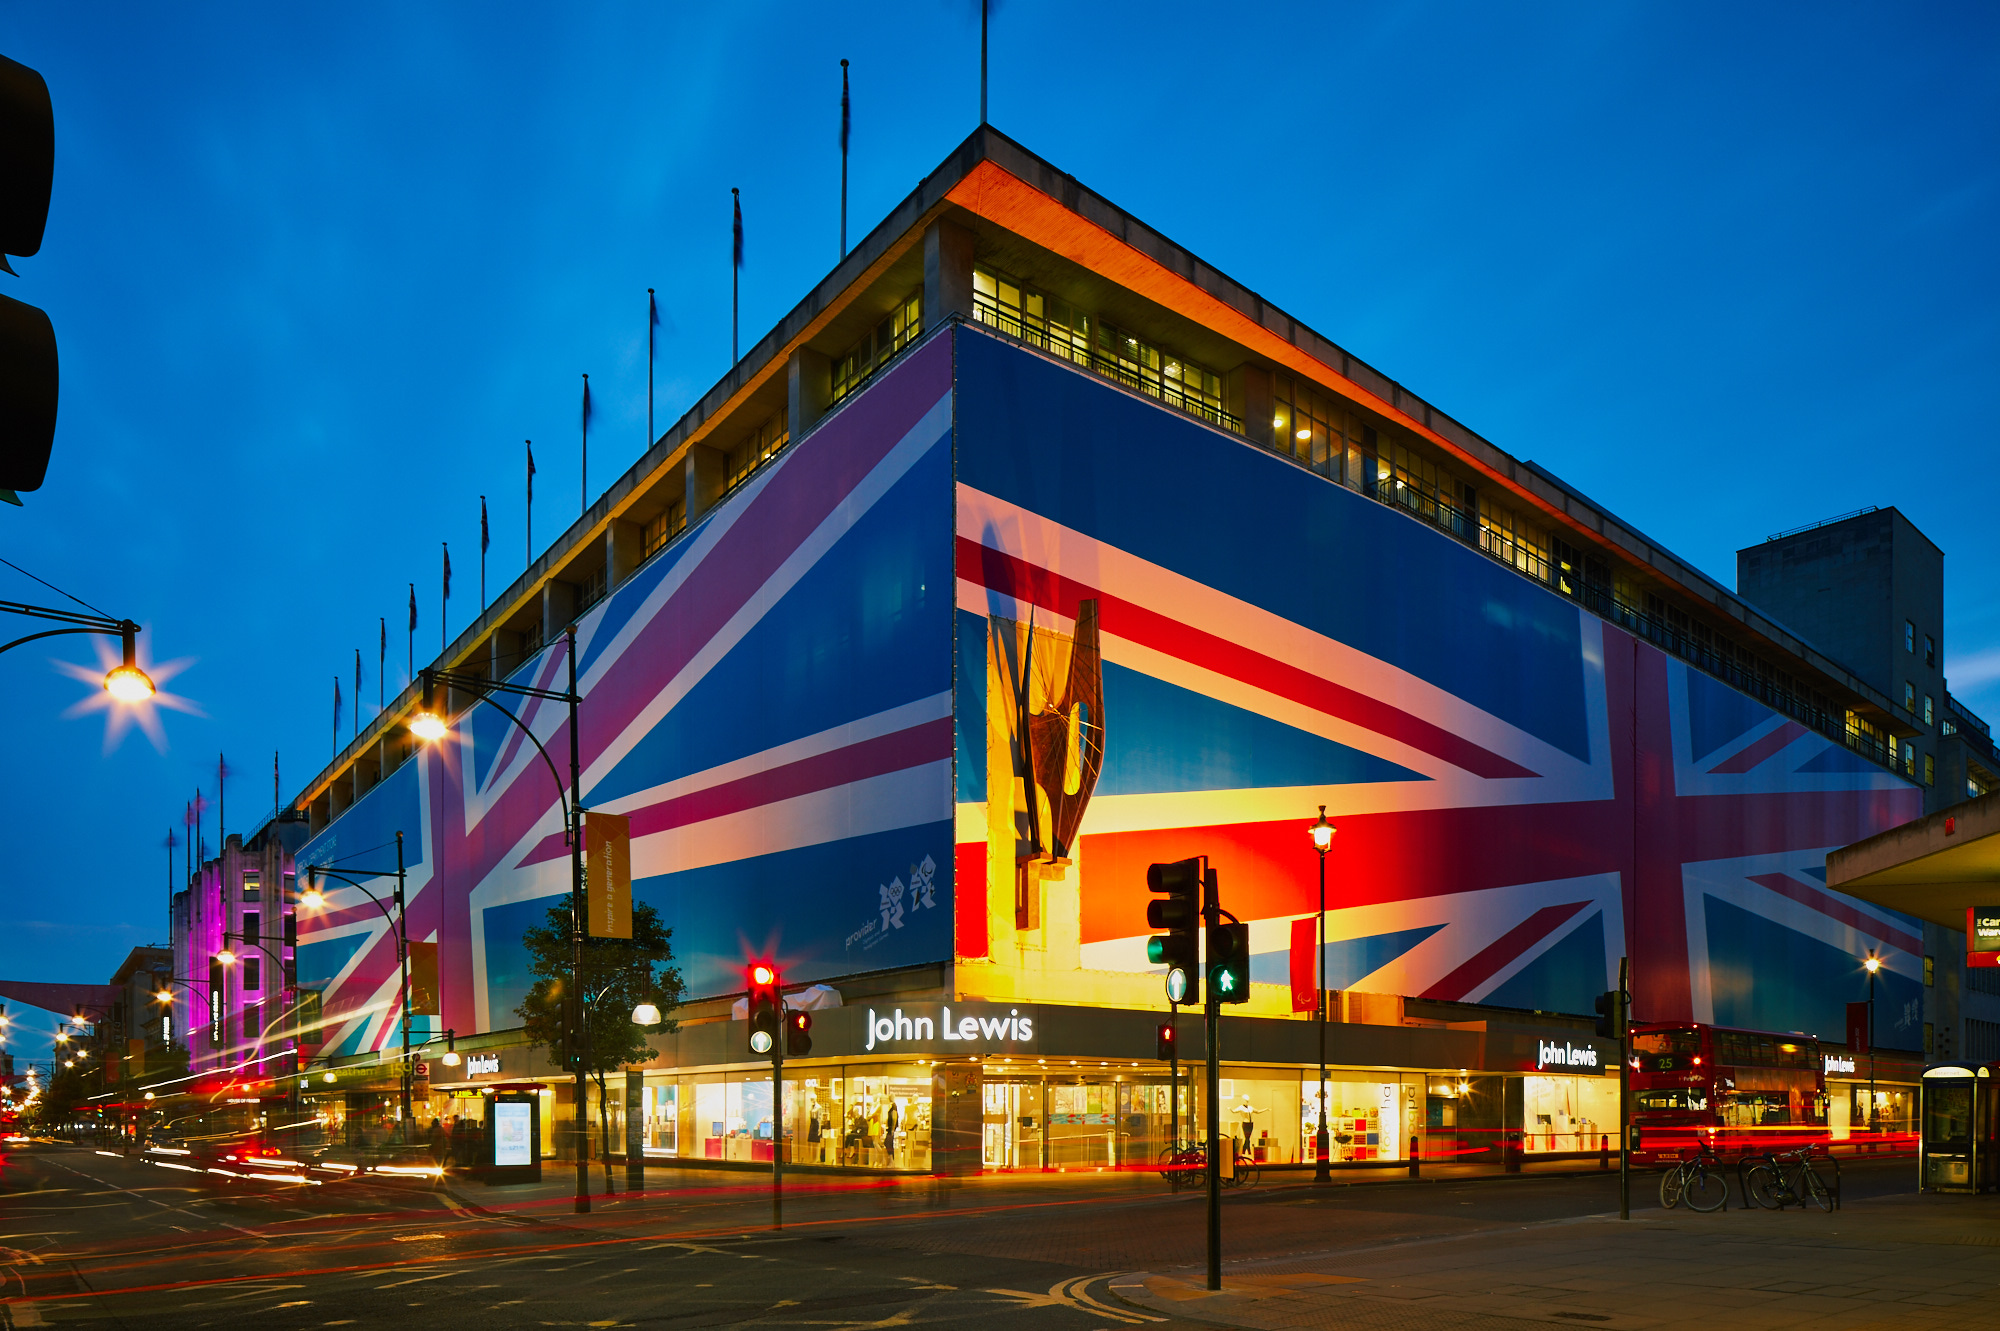 John Lewis, Oxford street, 2012, London